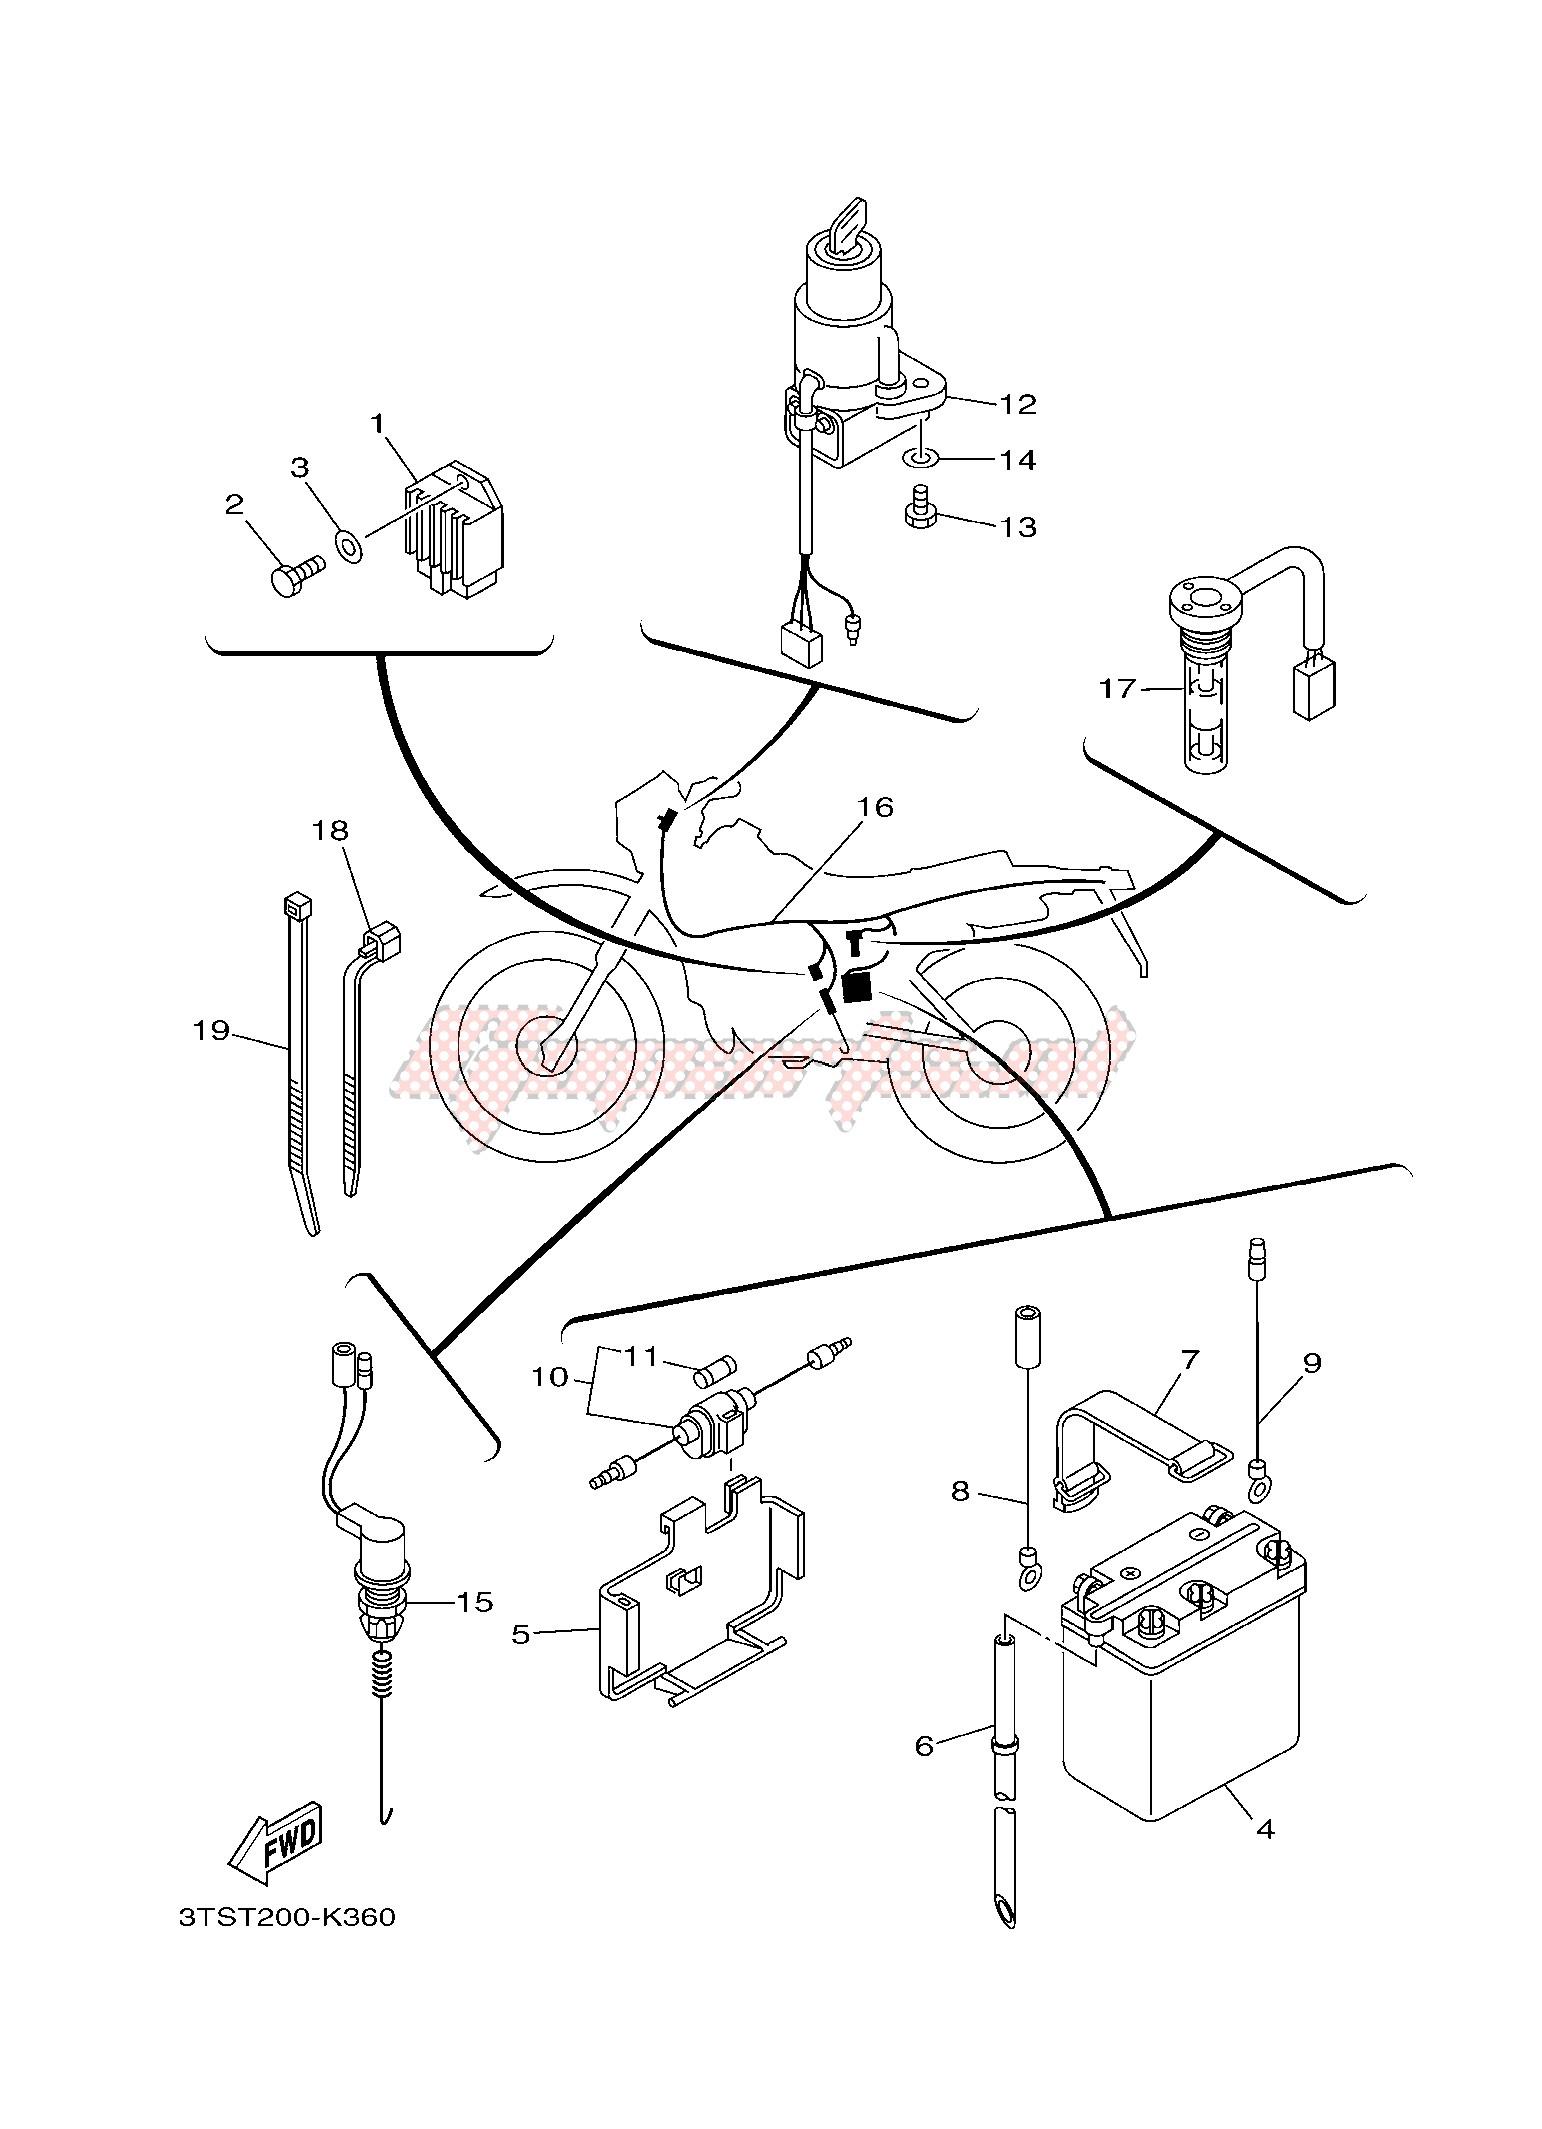 ELECTRICAL 1 blueprint